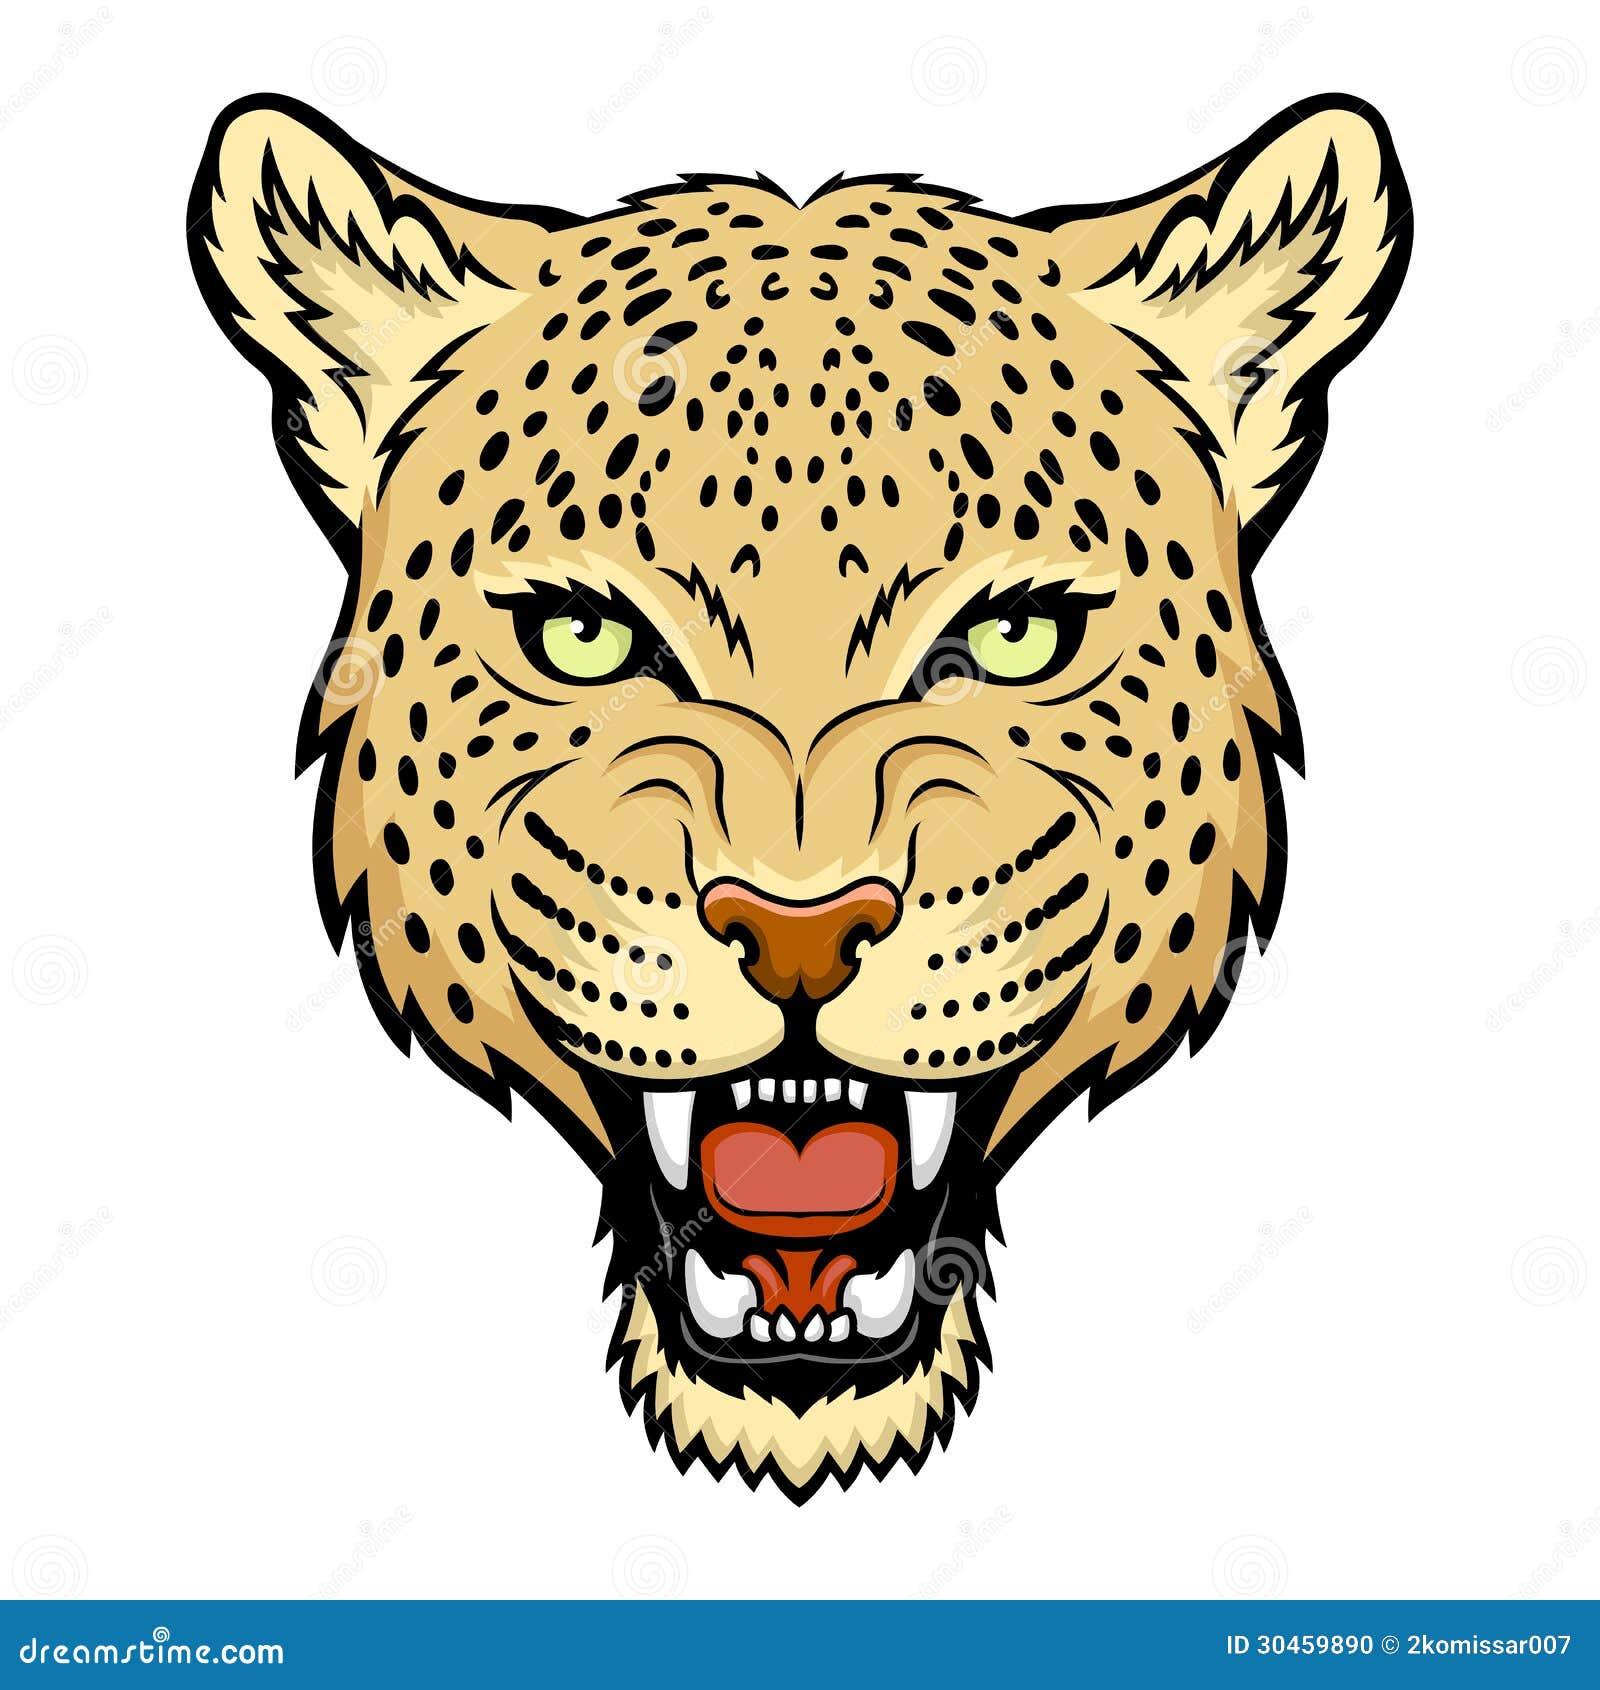 leopard roar stock illustrations 203 leopard roar stock rh dreamstime com Prints Clip Art Black Roses Leopard Clip Art